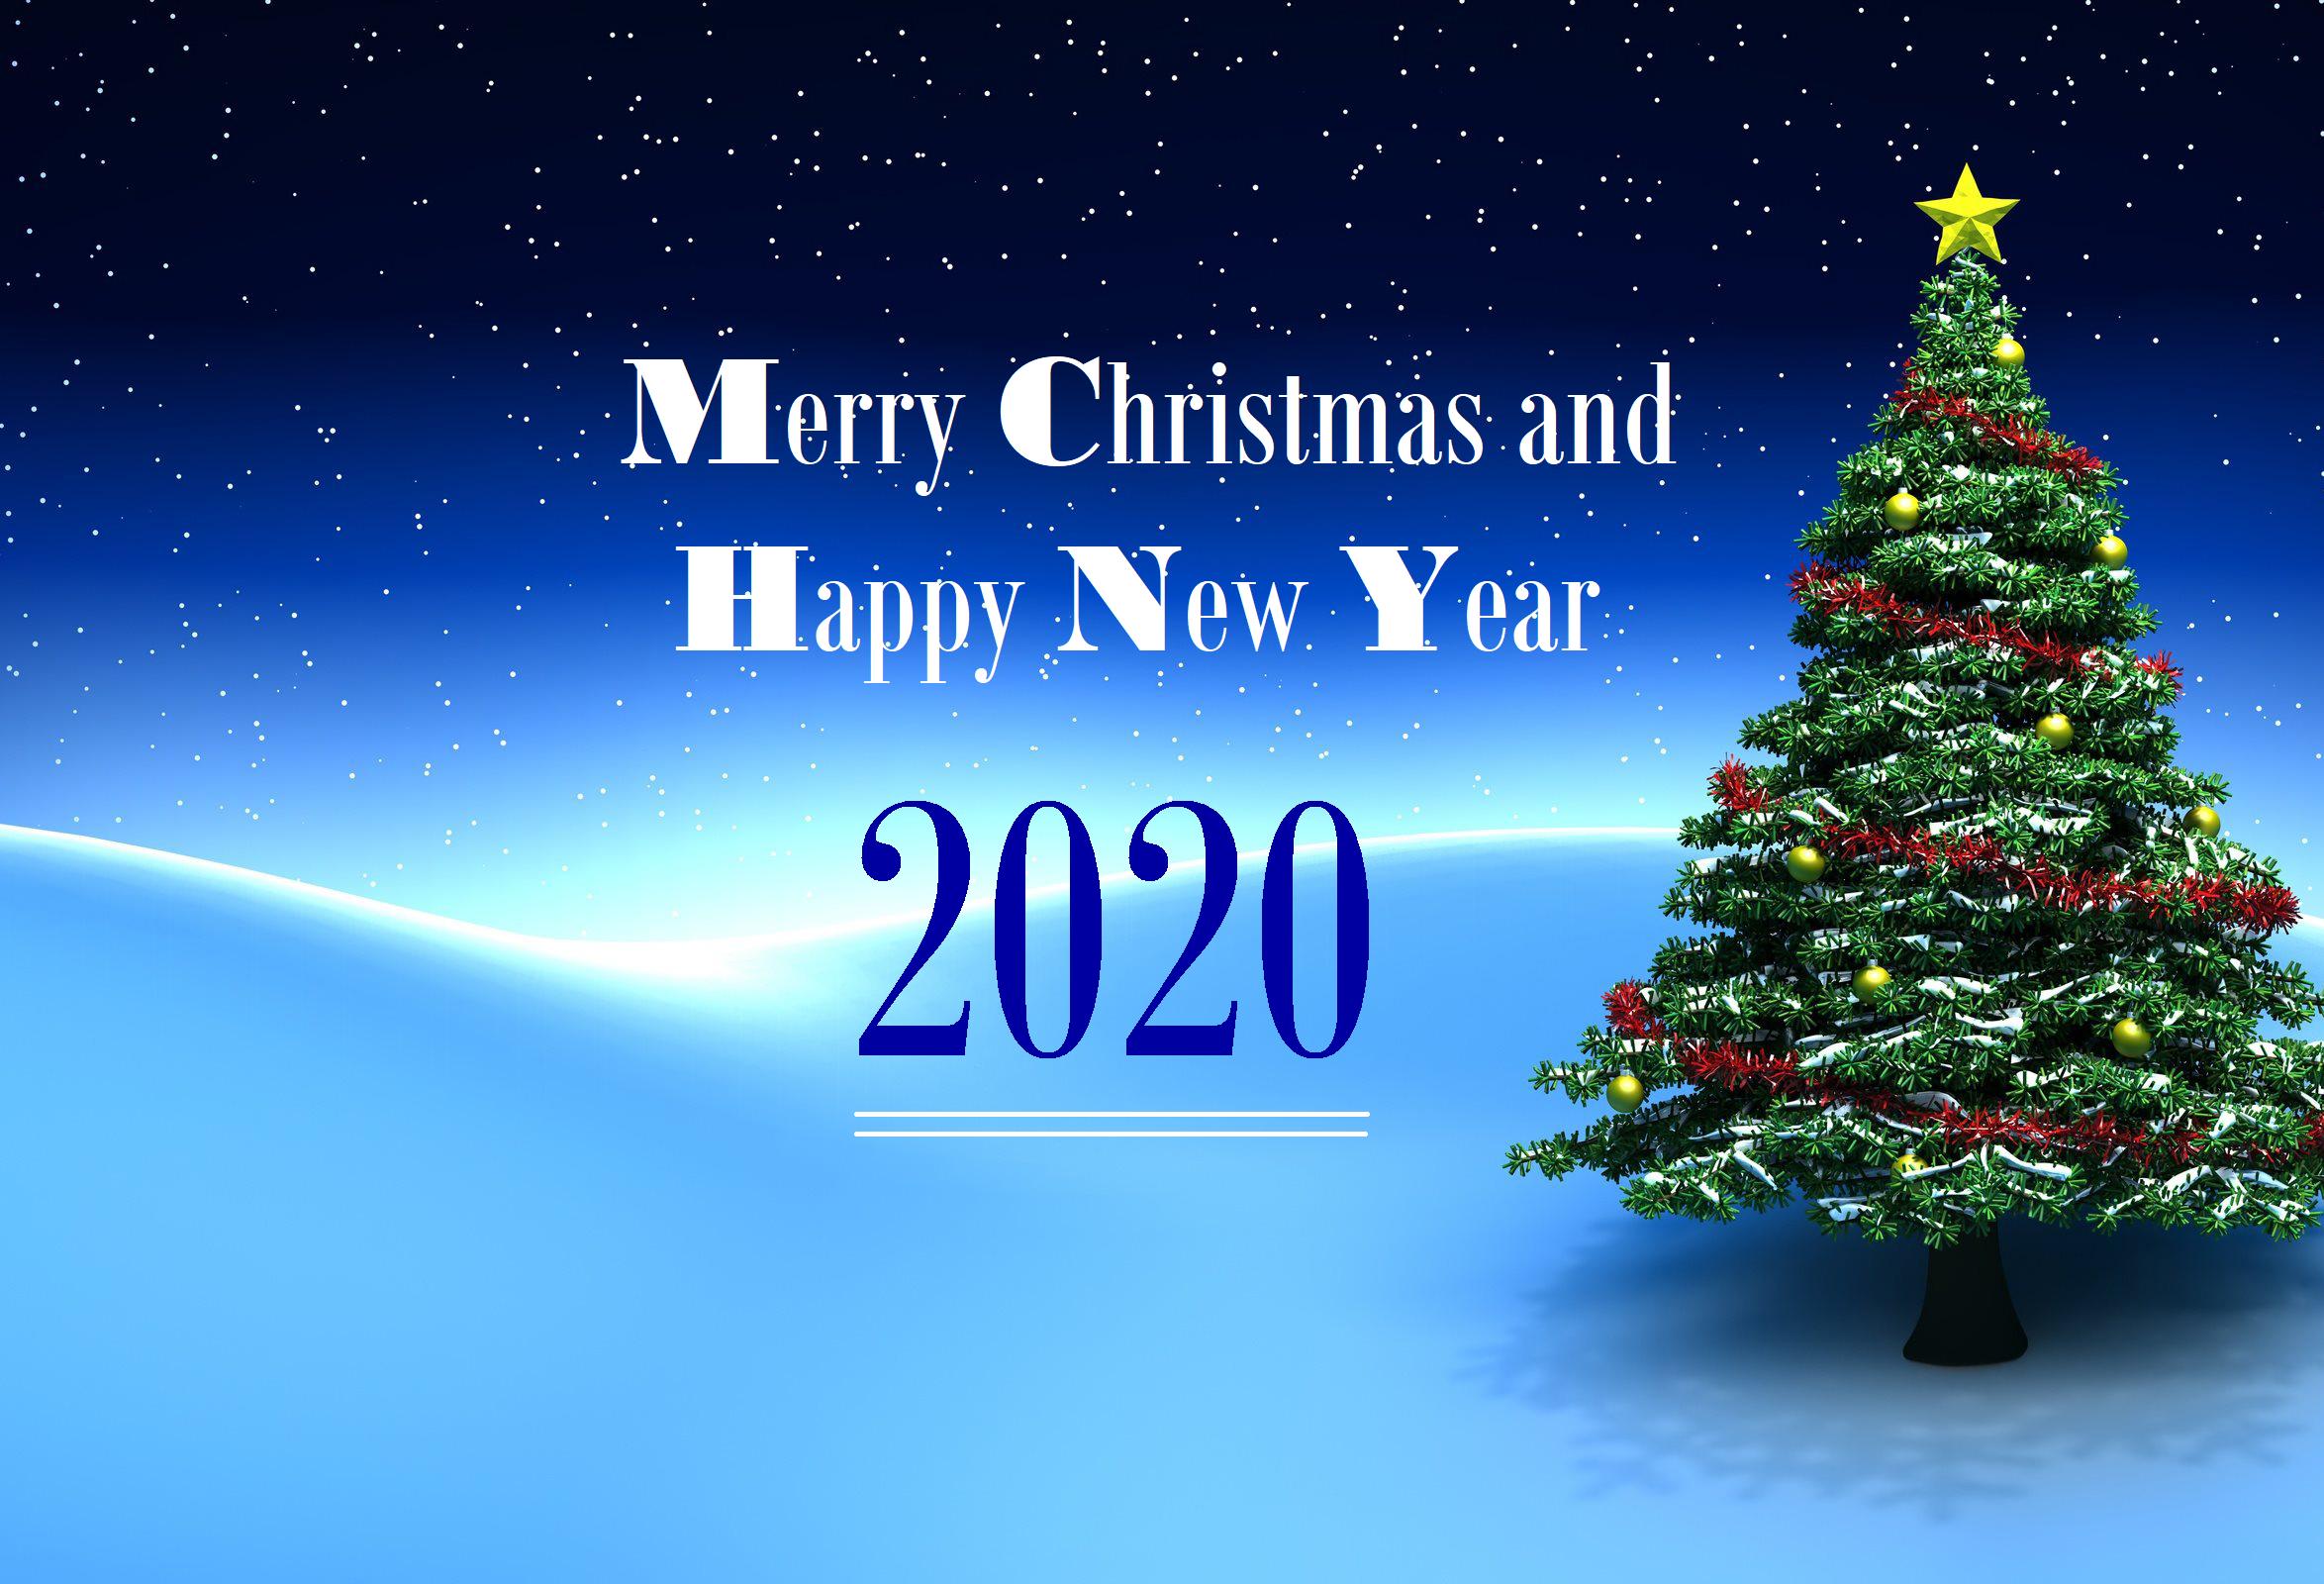 38] Happy Christmas 2020 Wallpapers on WallpaperSafari 2348x1600